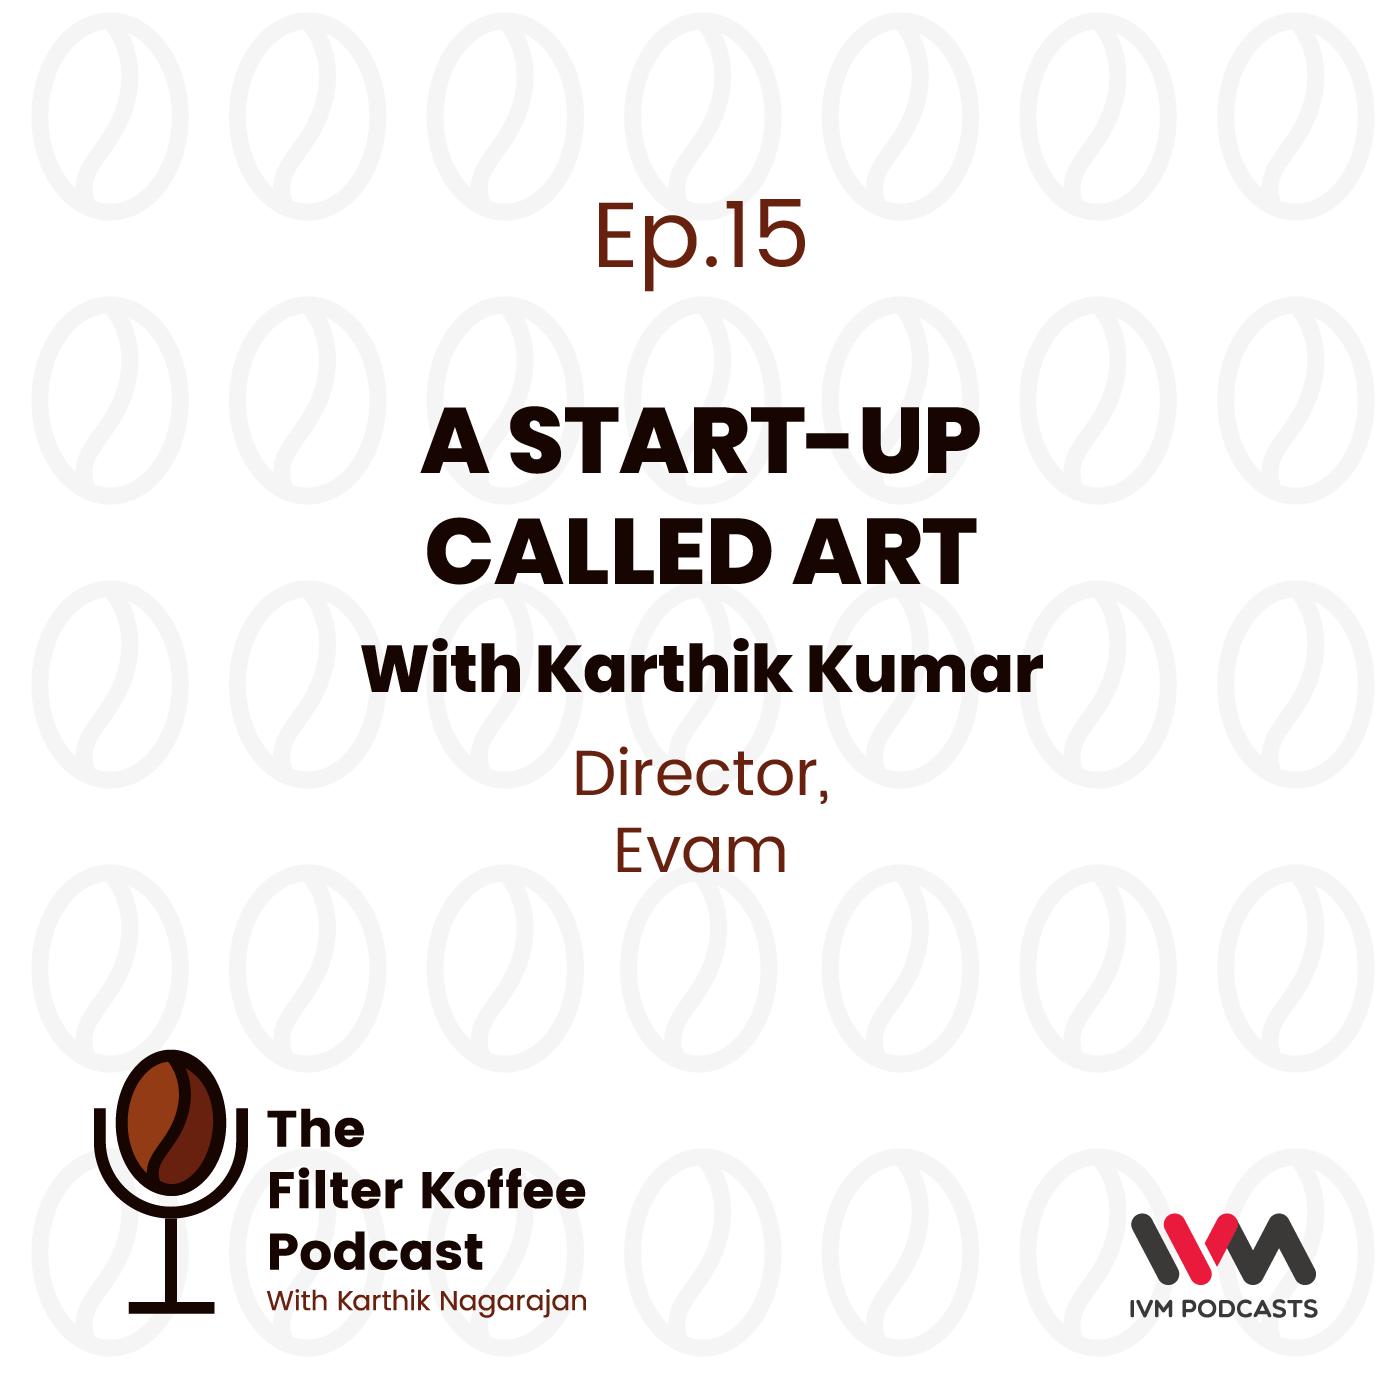 Ep. 15: A Start-Up Called Art with Karthik Kumar